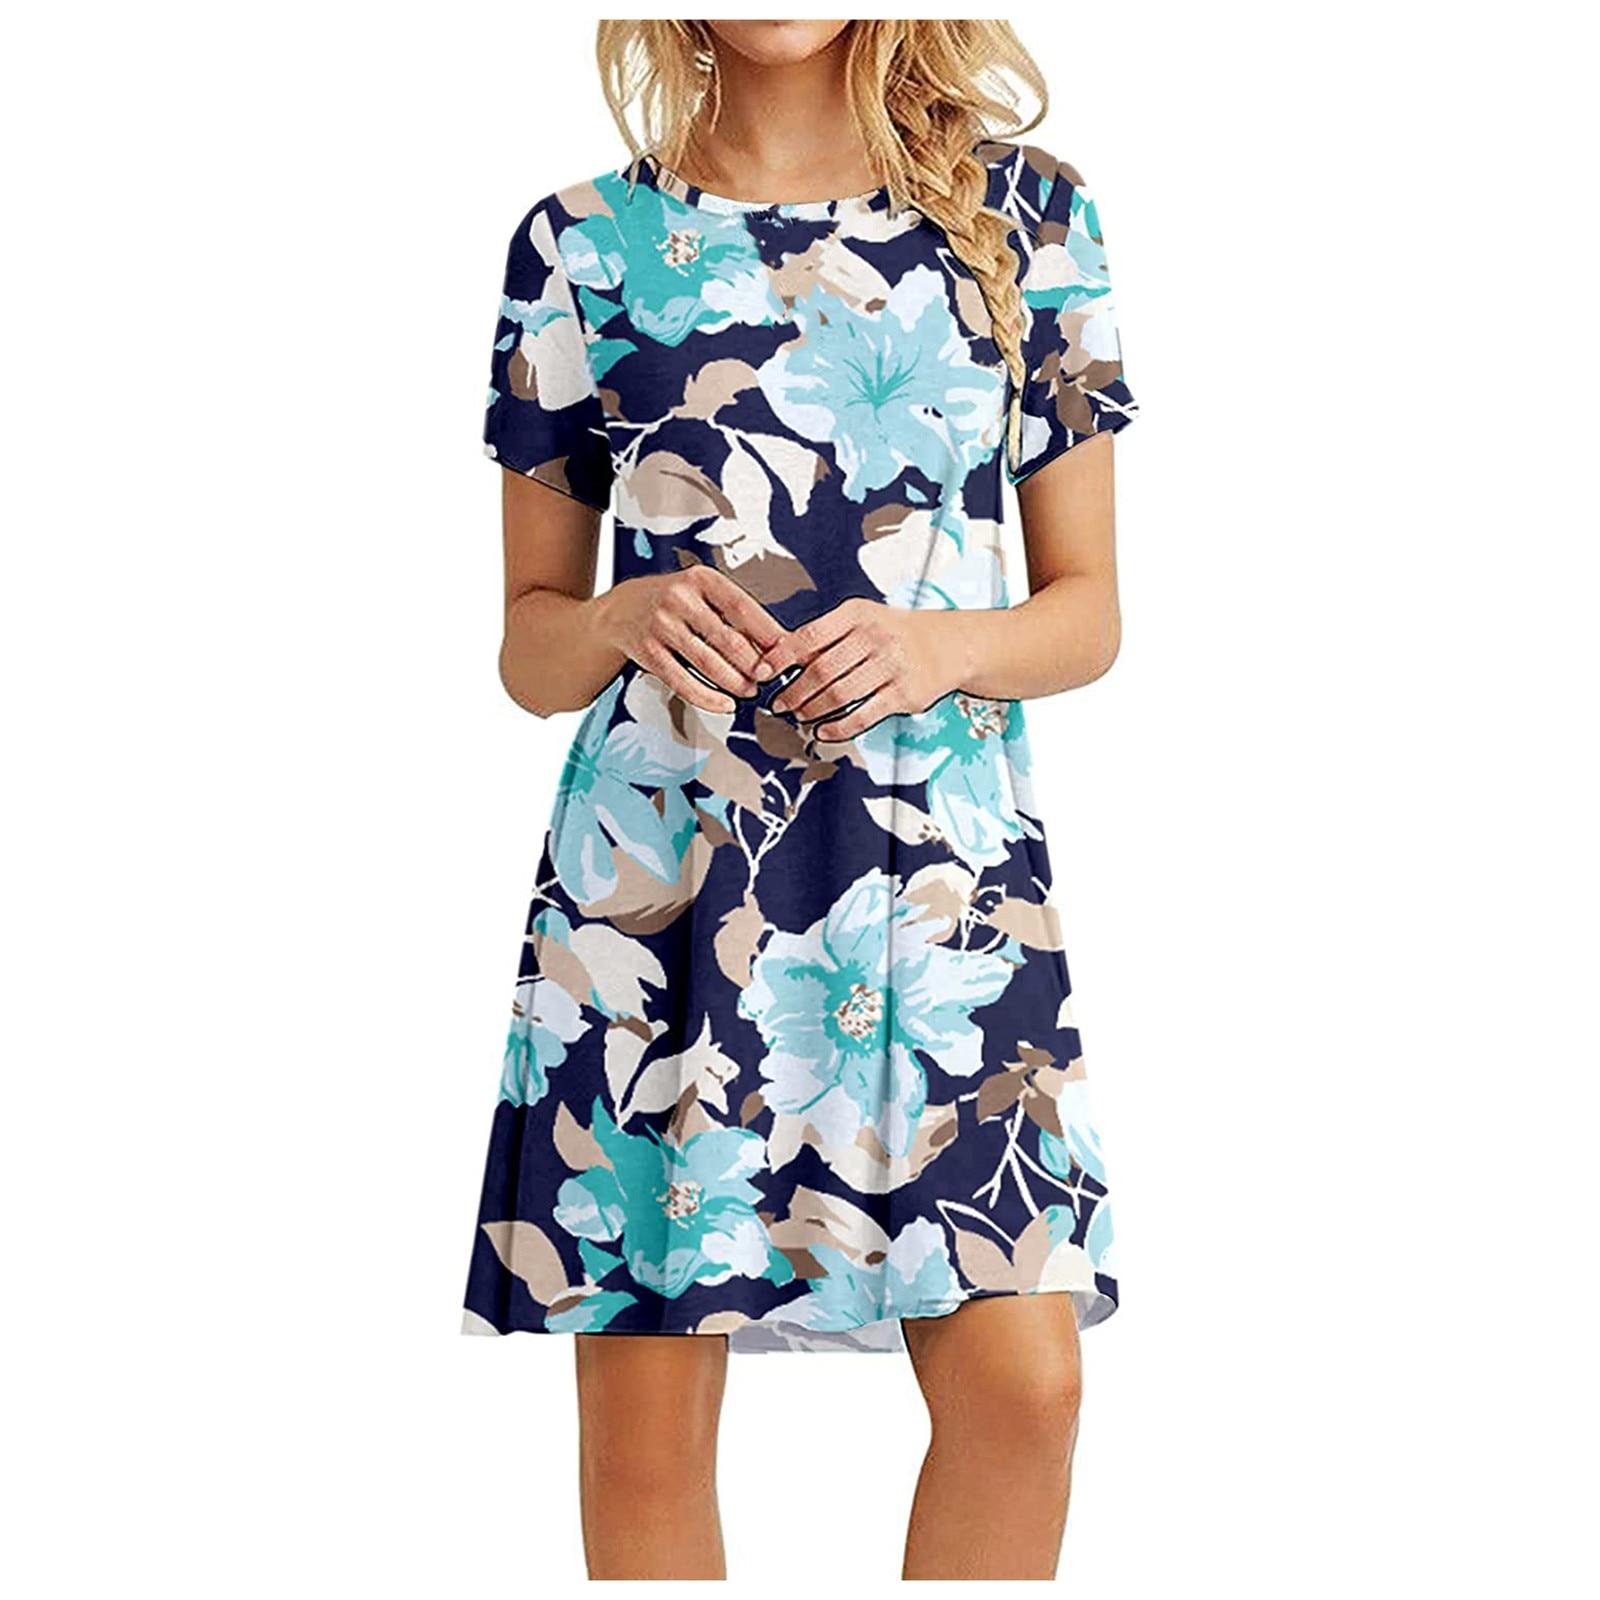 Women's Summer Casual Tshirt Dresses Short Sleeve Boho Beach Dress 3